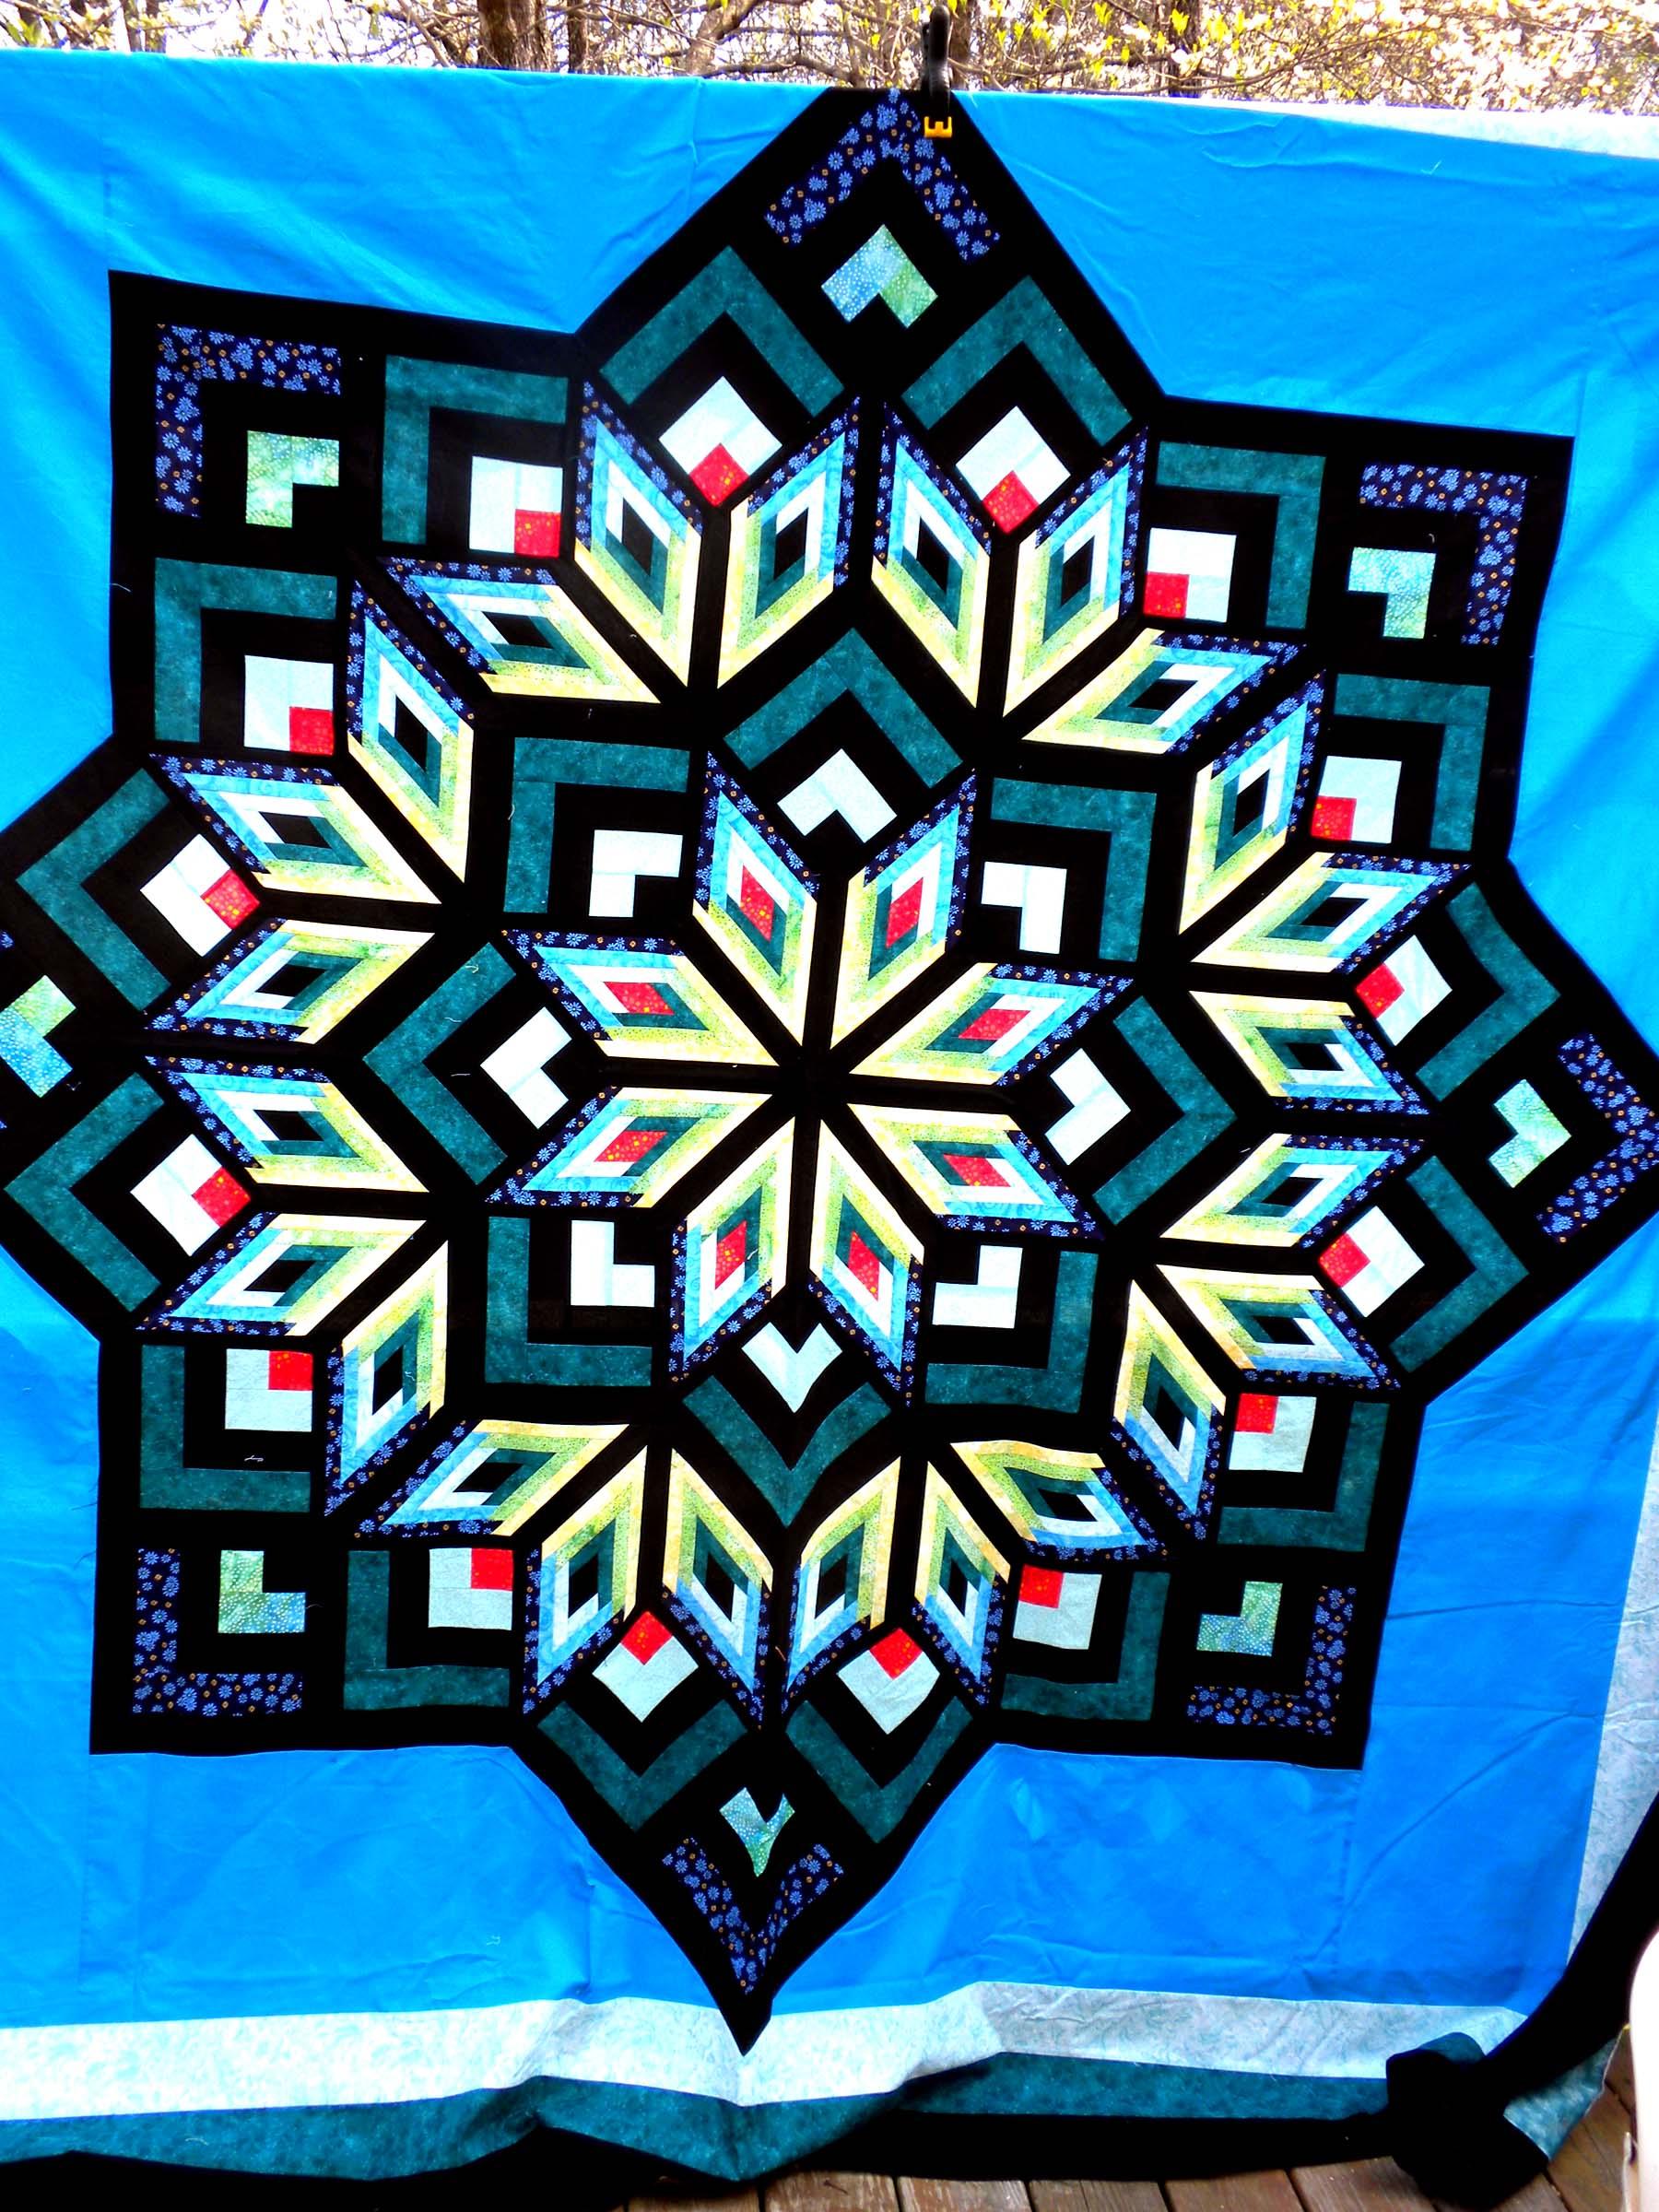 Log Cabin Star Quilt Pattern : log cabin diamond quilt pattern - Adamdwight.com